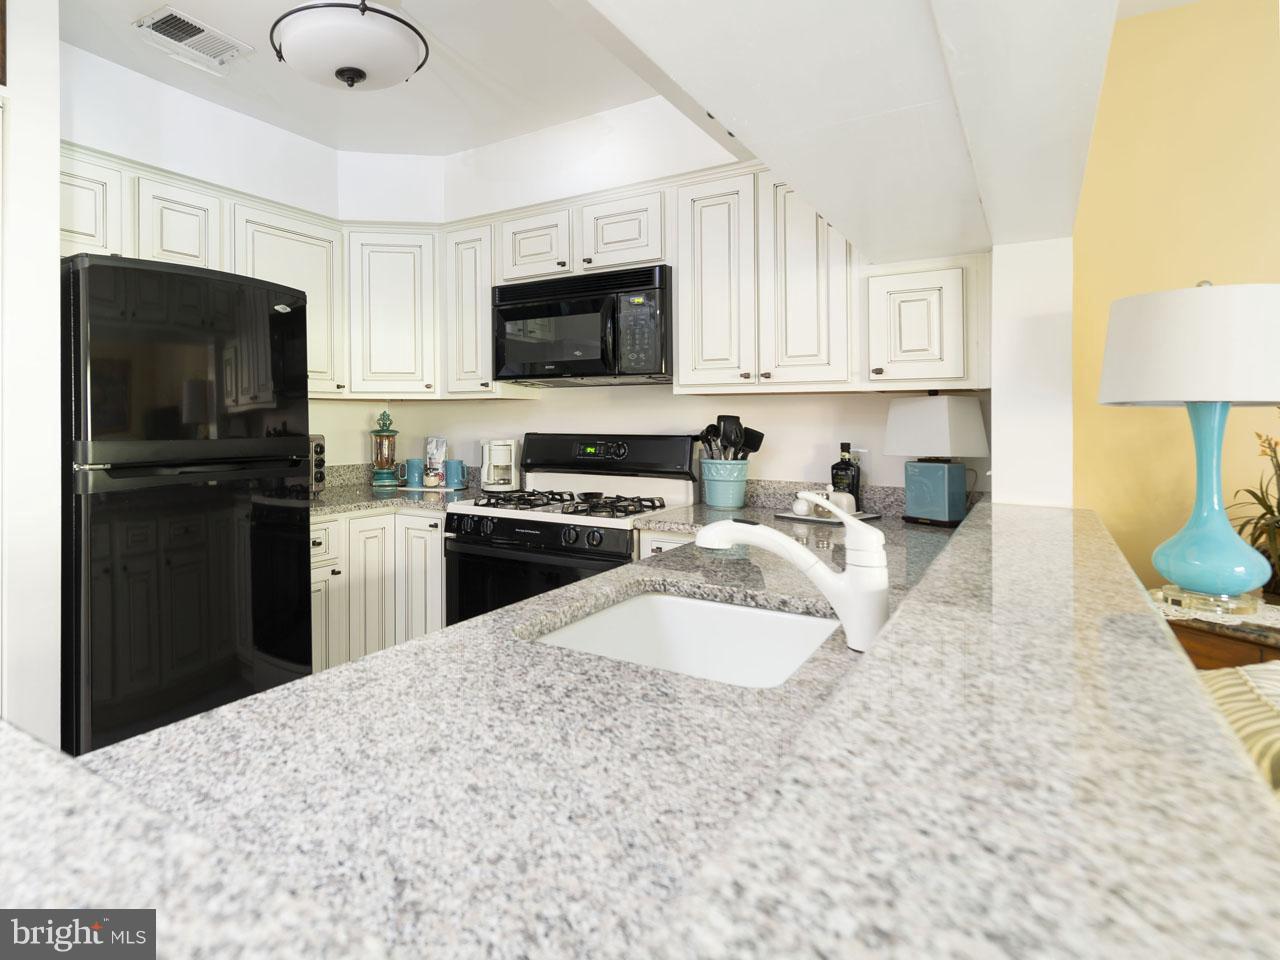 1002640508-300537942844-2021-07-22-05-00-37     Pinecrest   Alexandria Delaware Real Estate For Sale   MLS# 1002640508  - Best of Northern Virginia